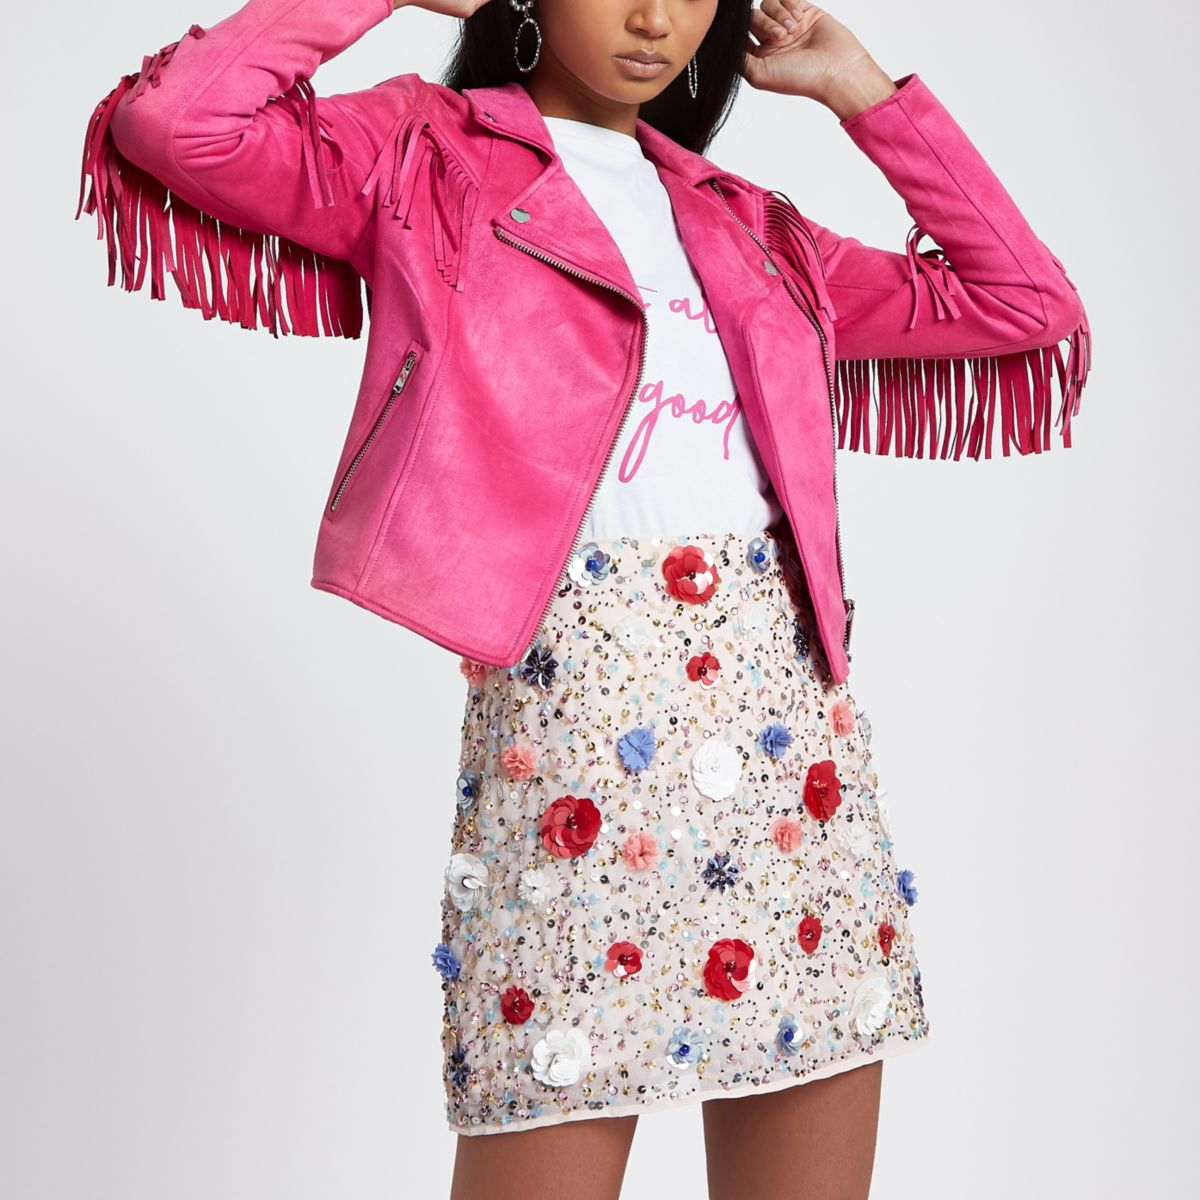 Bright pink faux suede fringed biker jacket